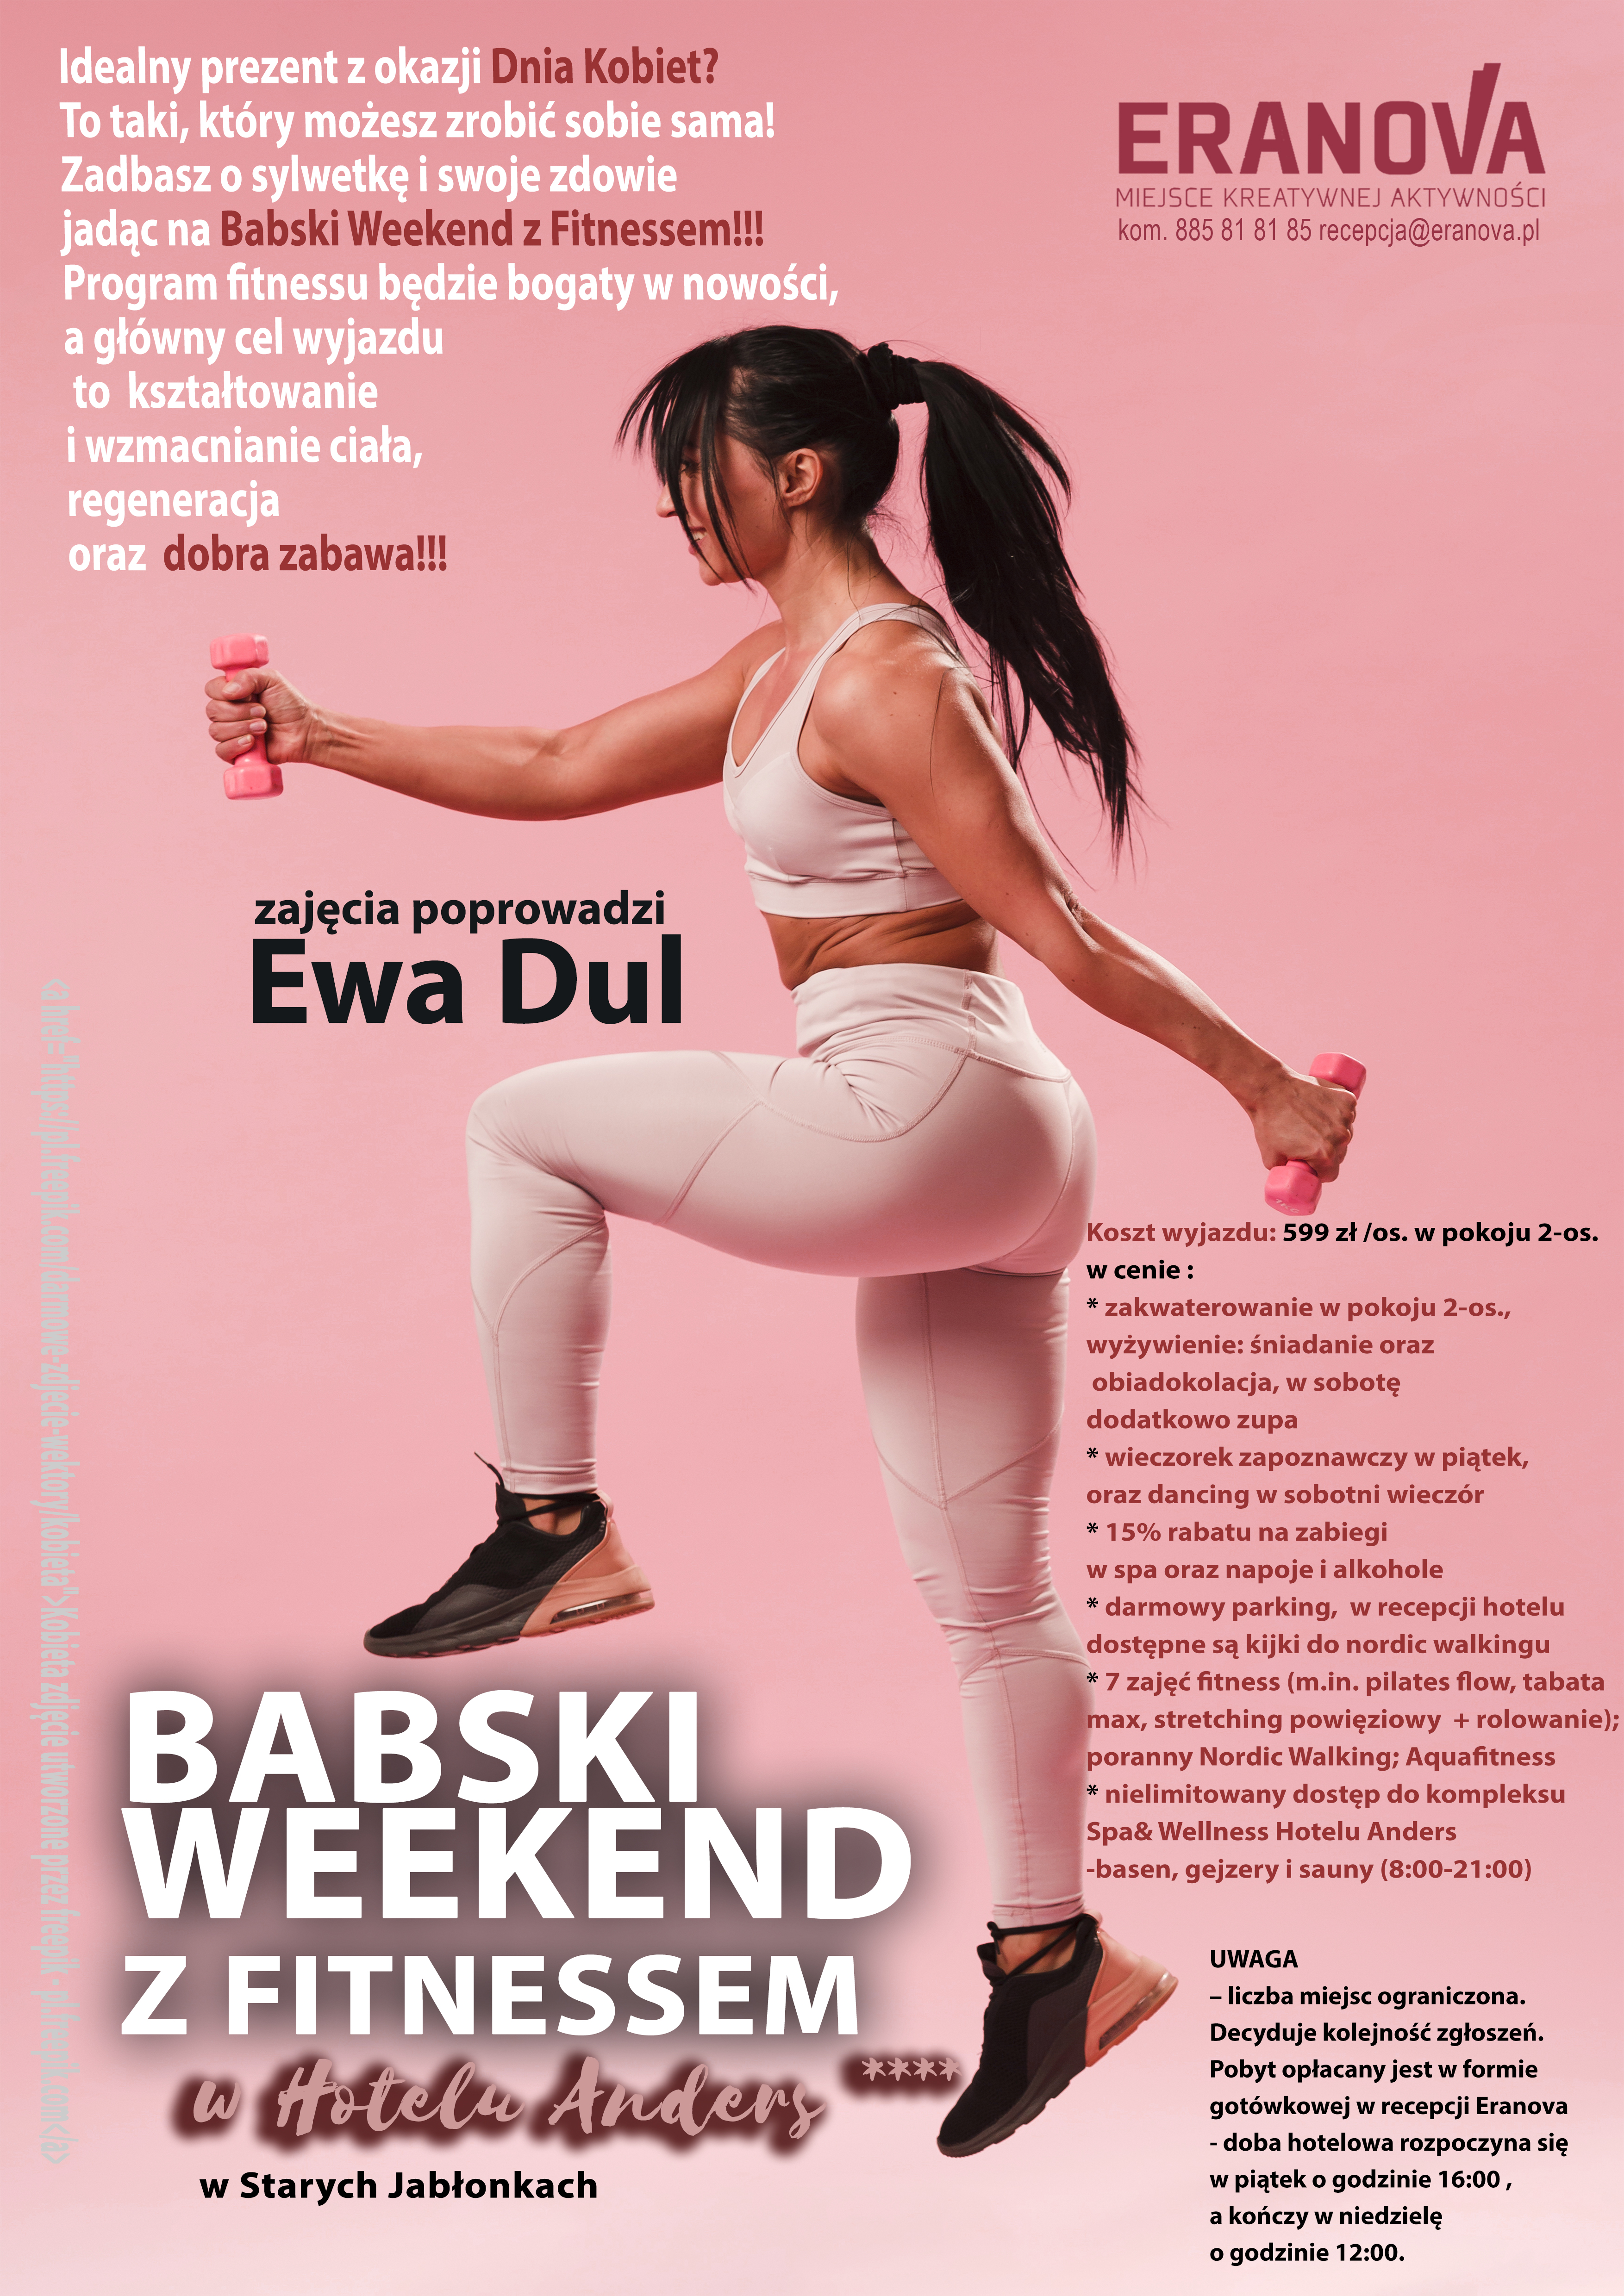 http://m.eranova.pl/2020/03/orig/weekend-z-fitnessem-w-ha-3298.jpg